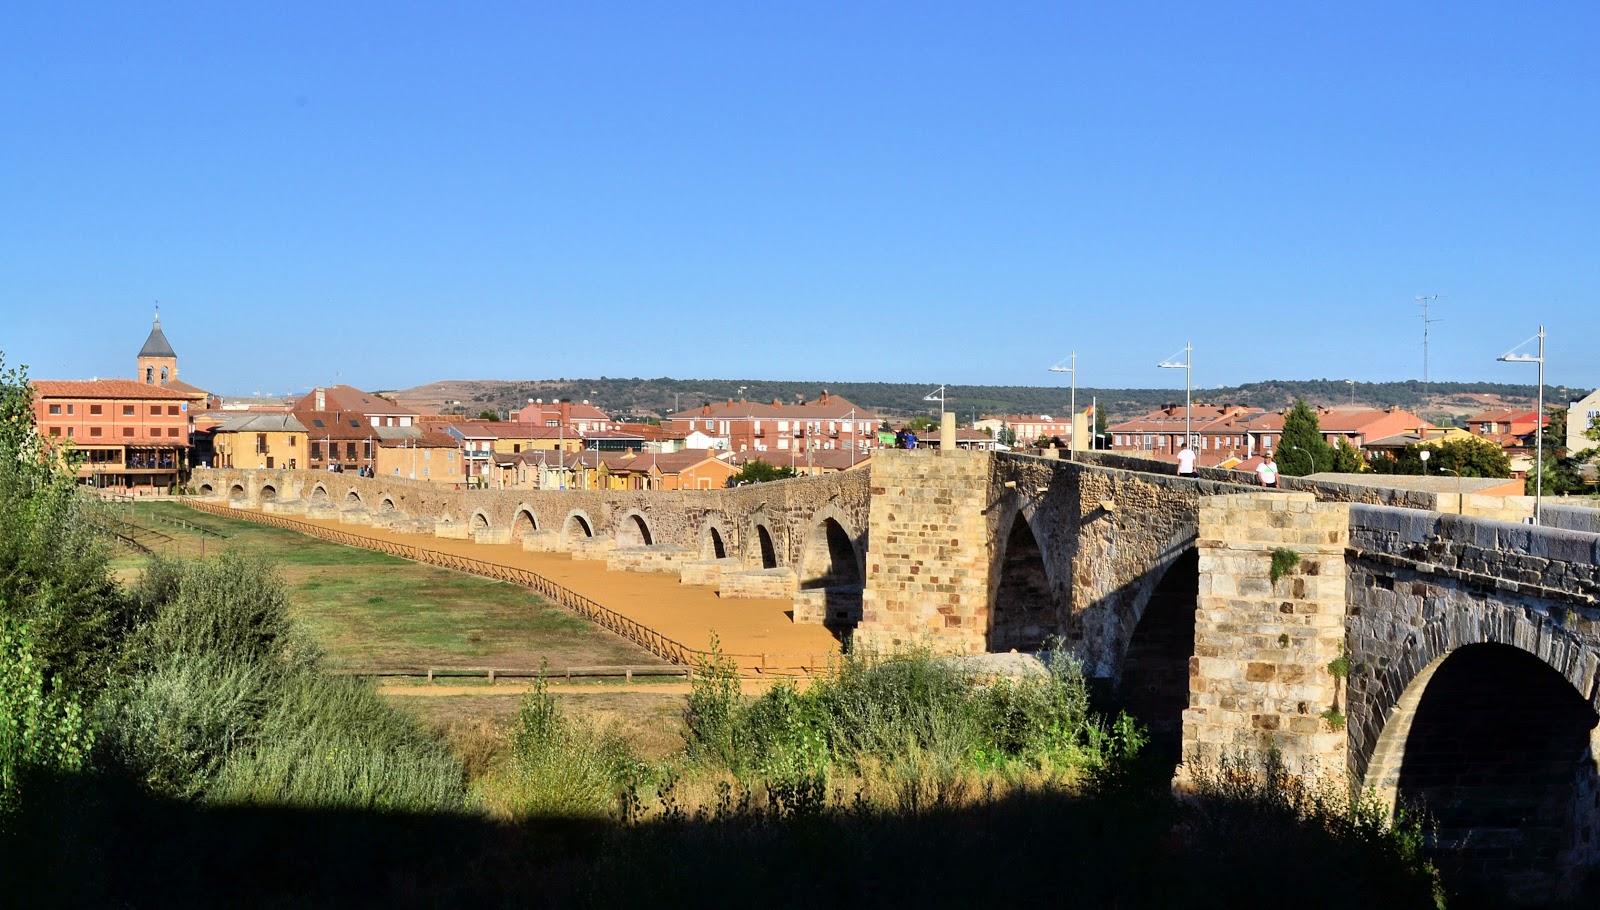 Puente de Orbigo in Hospital de Orbigo was where I began my first day on the Camino.